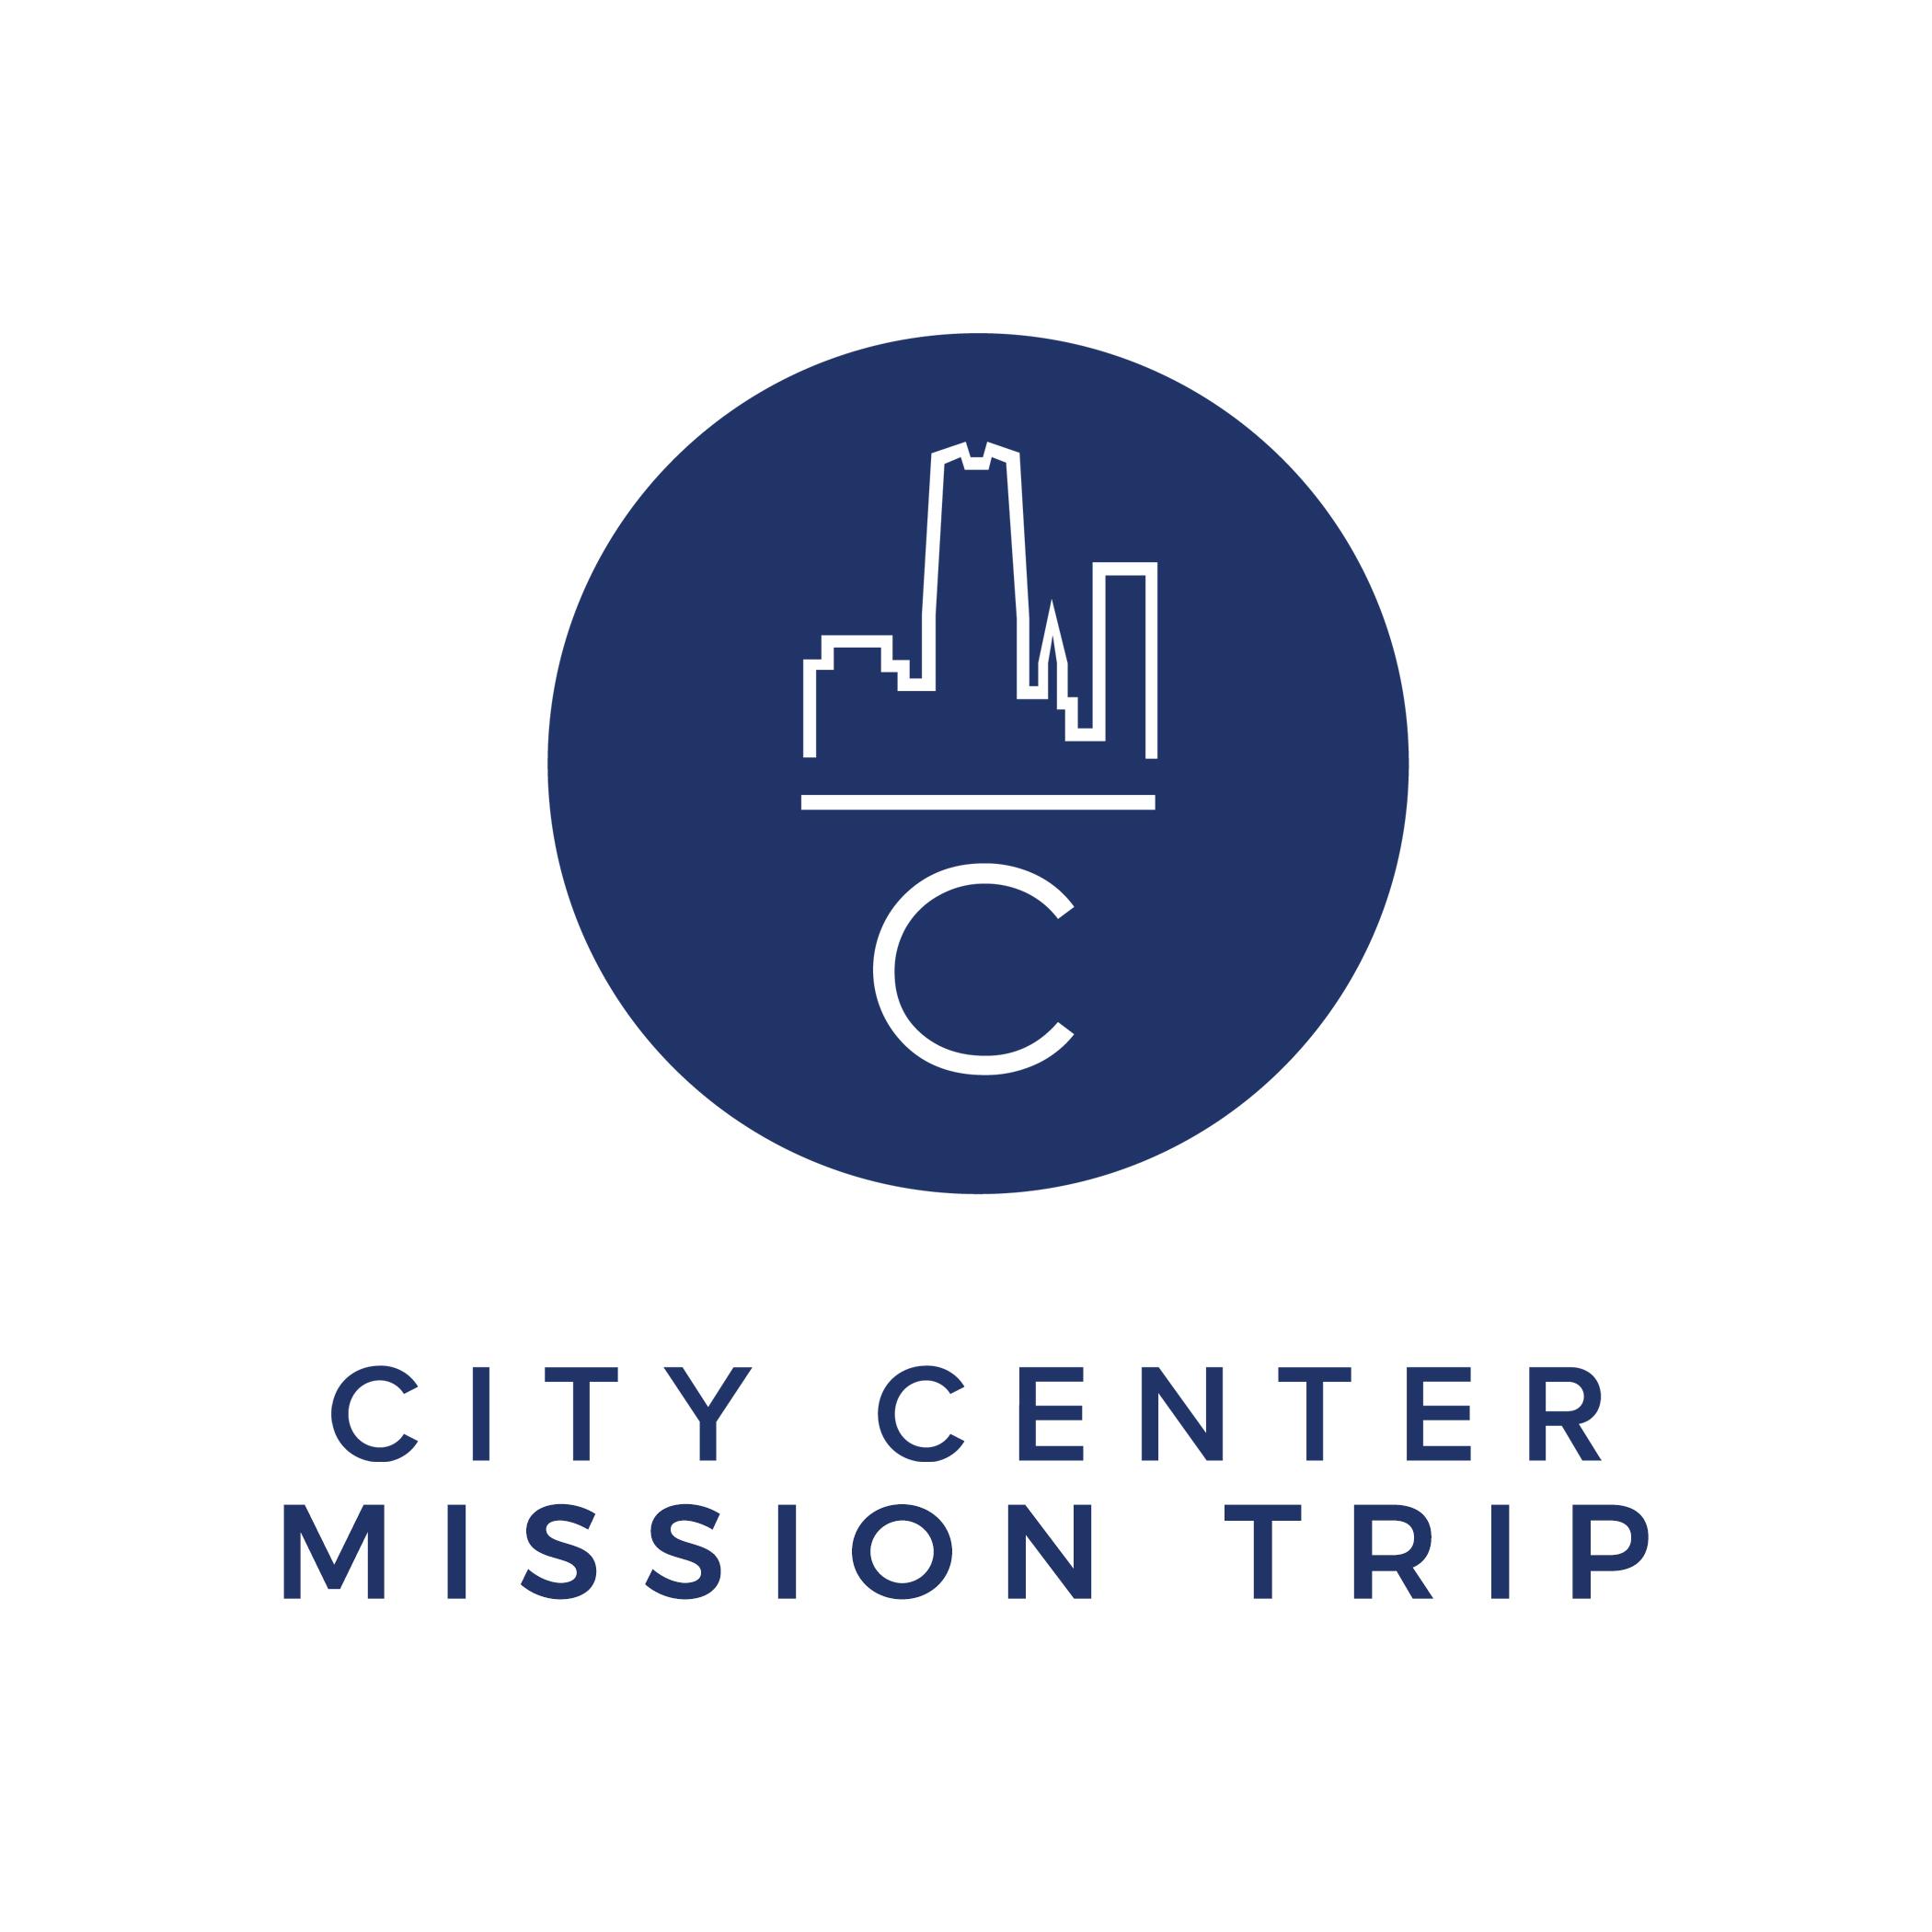 Oklahoma City Center Mission Trip -